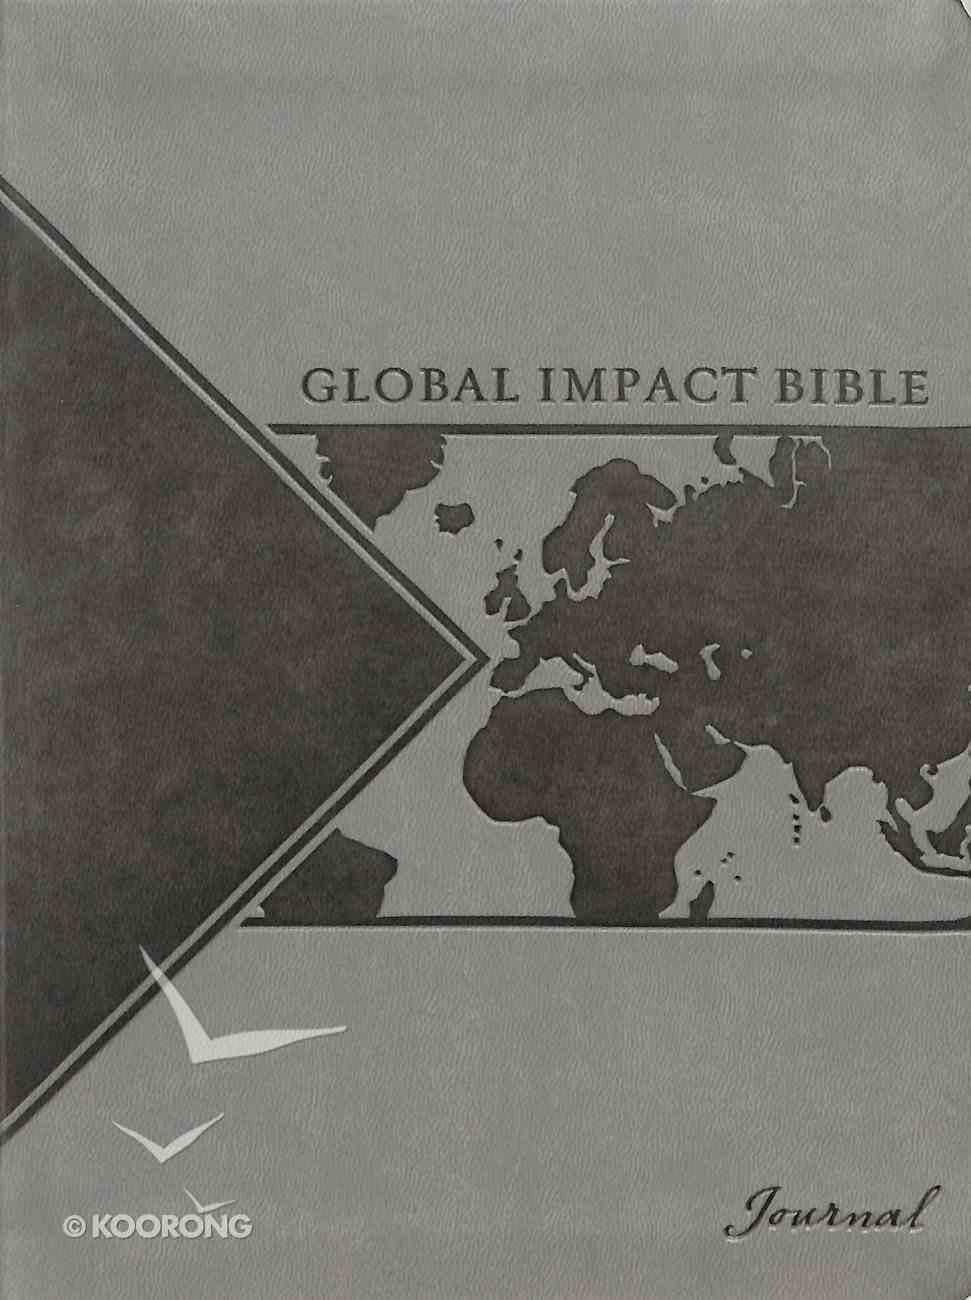 Leatherluxe Journal: Global Impact Bible Journal Imitation Leather